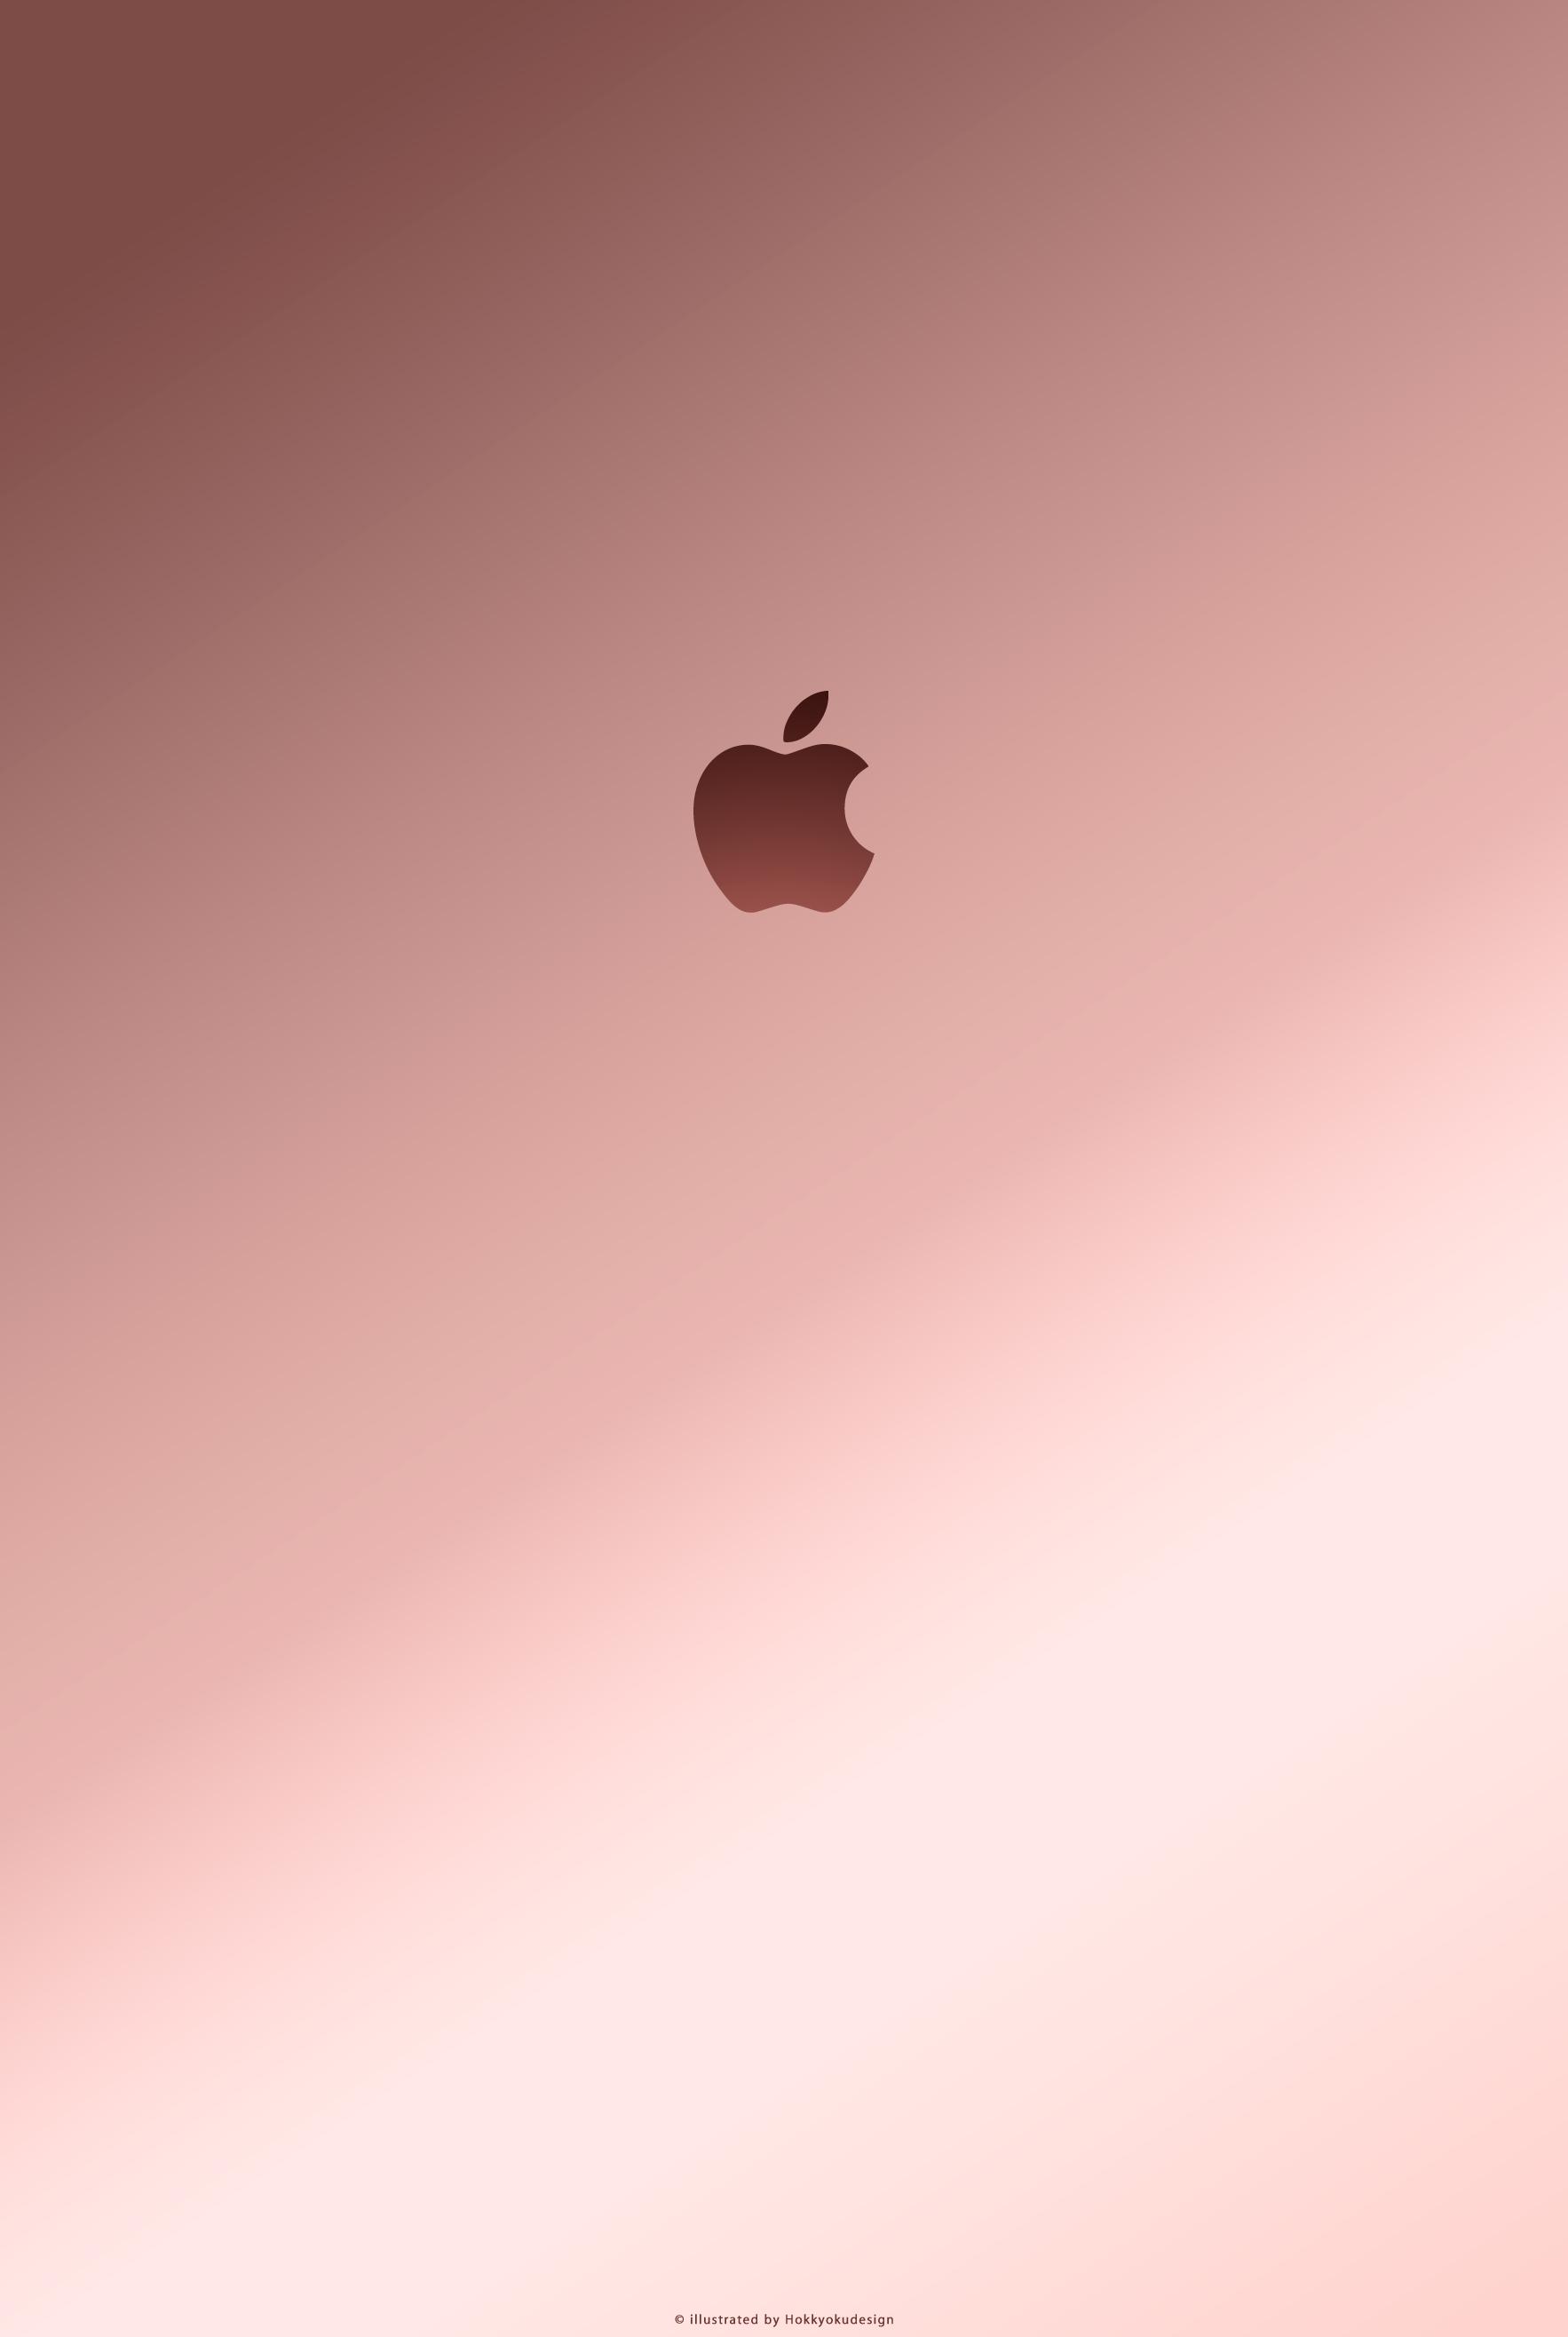 Apple Iphone Rose Wallpaper Rose Gold Wallpaper Rose Wallpaper Gold Wallpaper Background